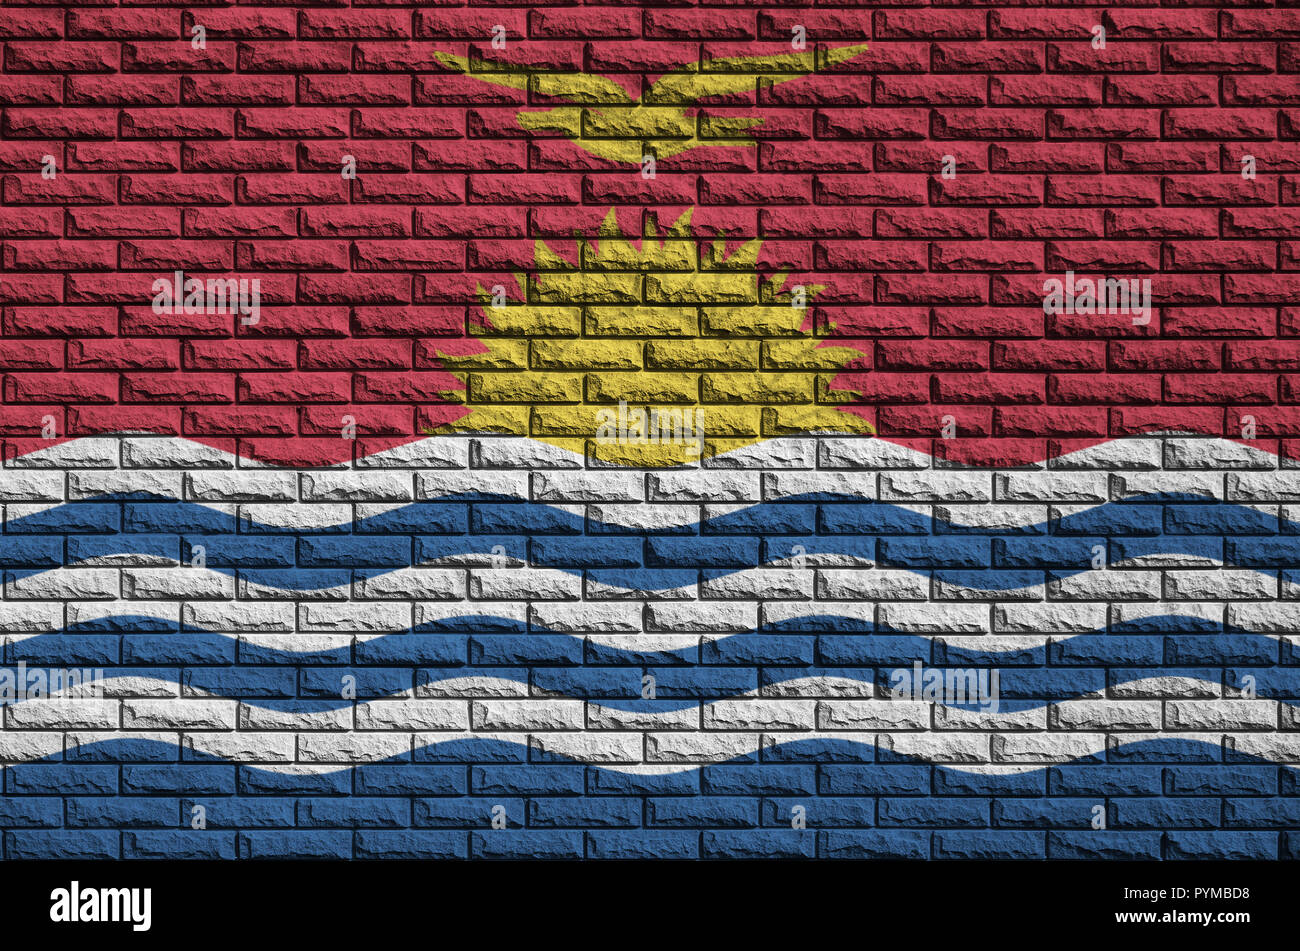 Kiribati flag is painted onto an old brick wall - Stock Image